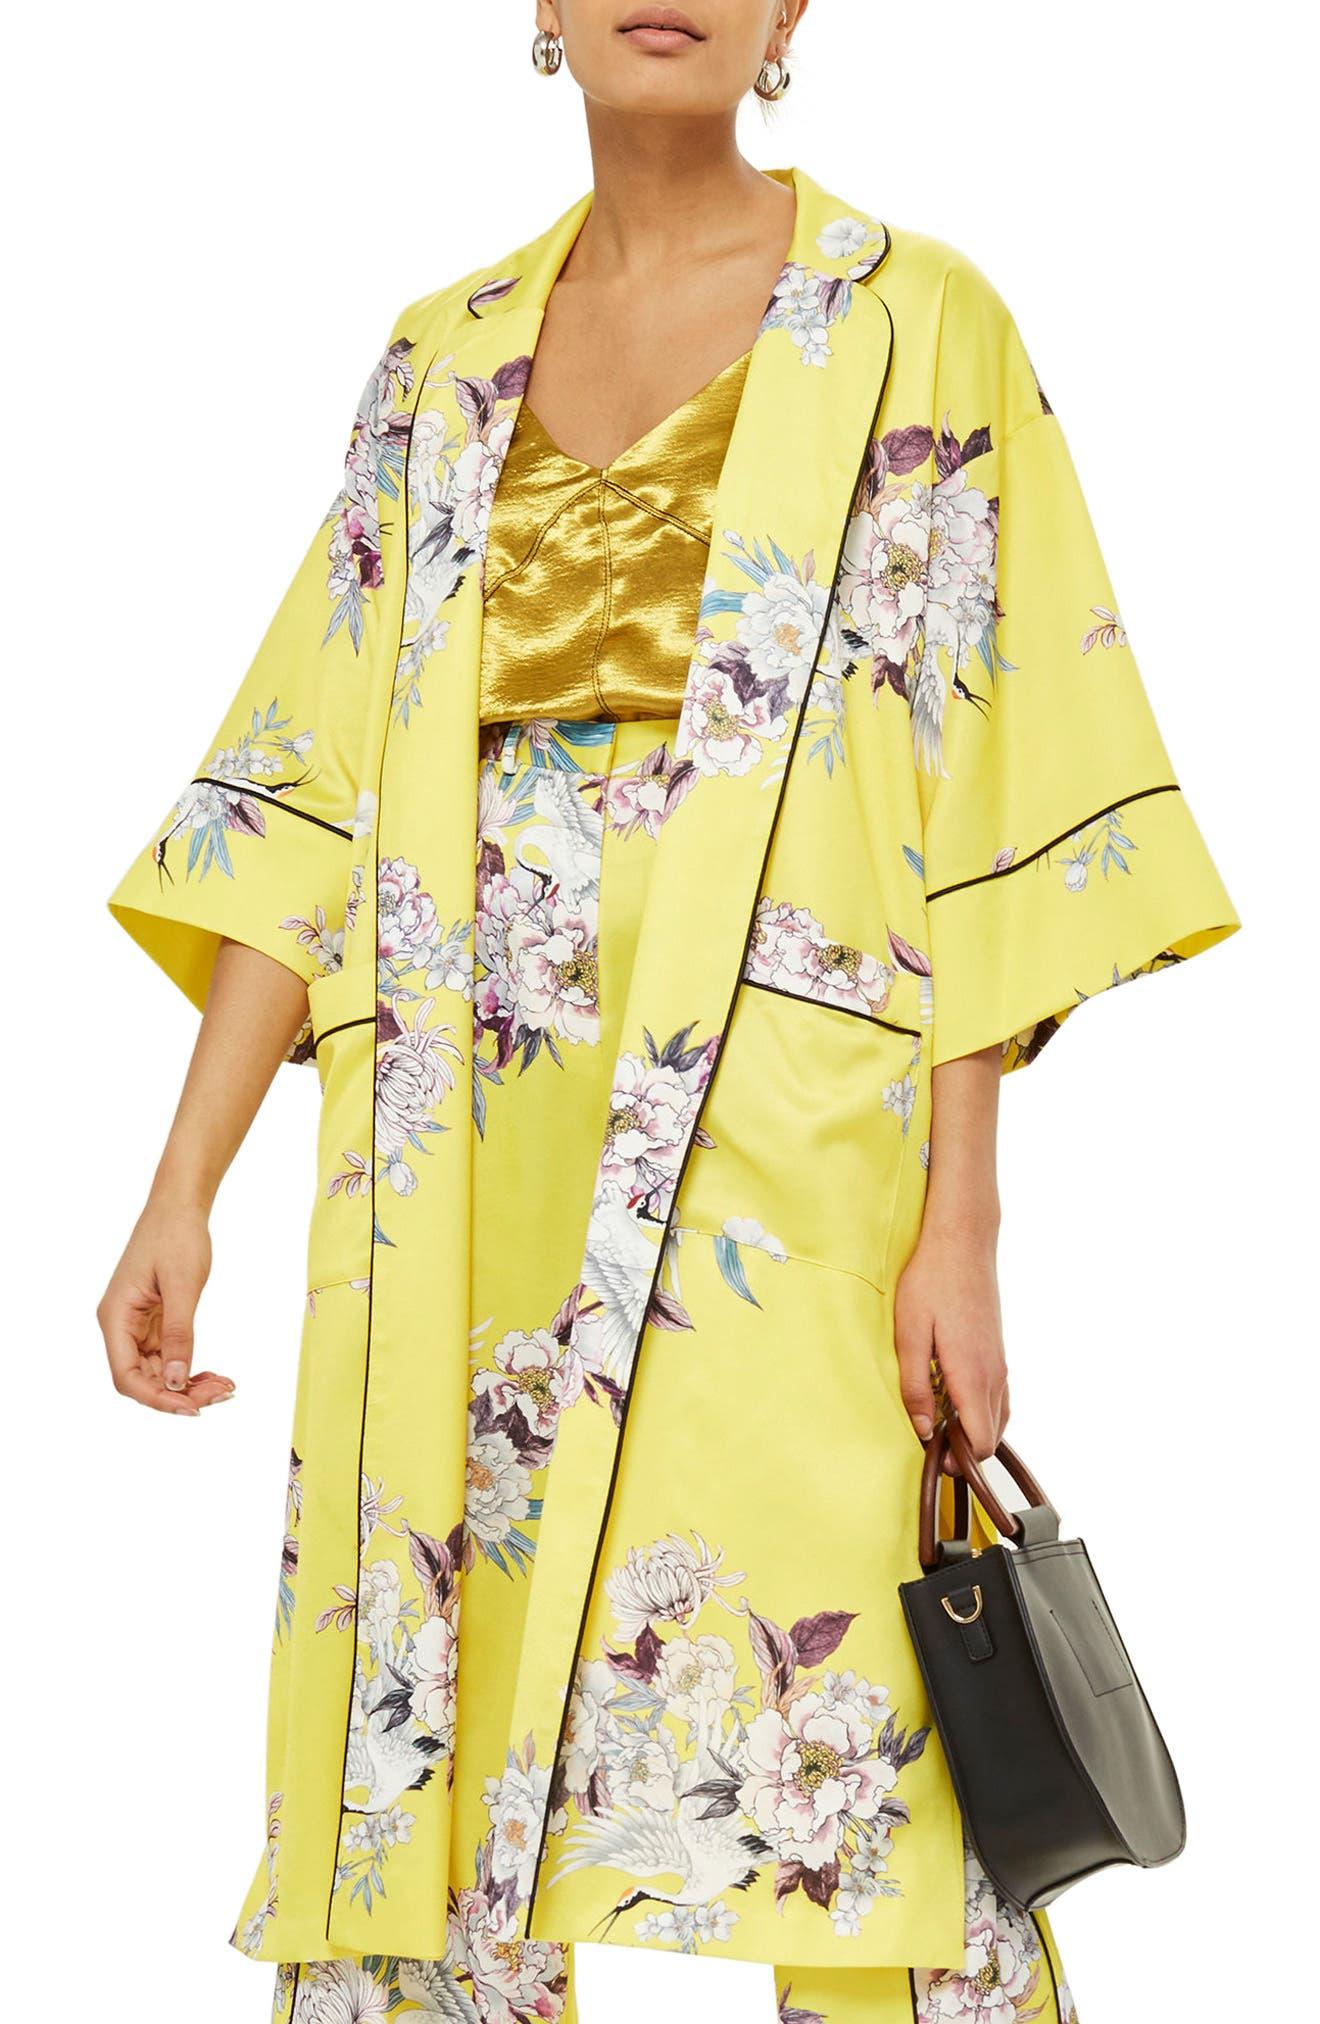 Heron Print Kimono,                             Main thumbnail 1, color,                             Yellow Multi